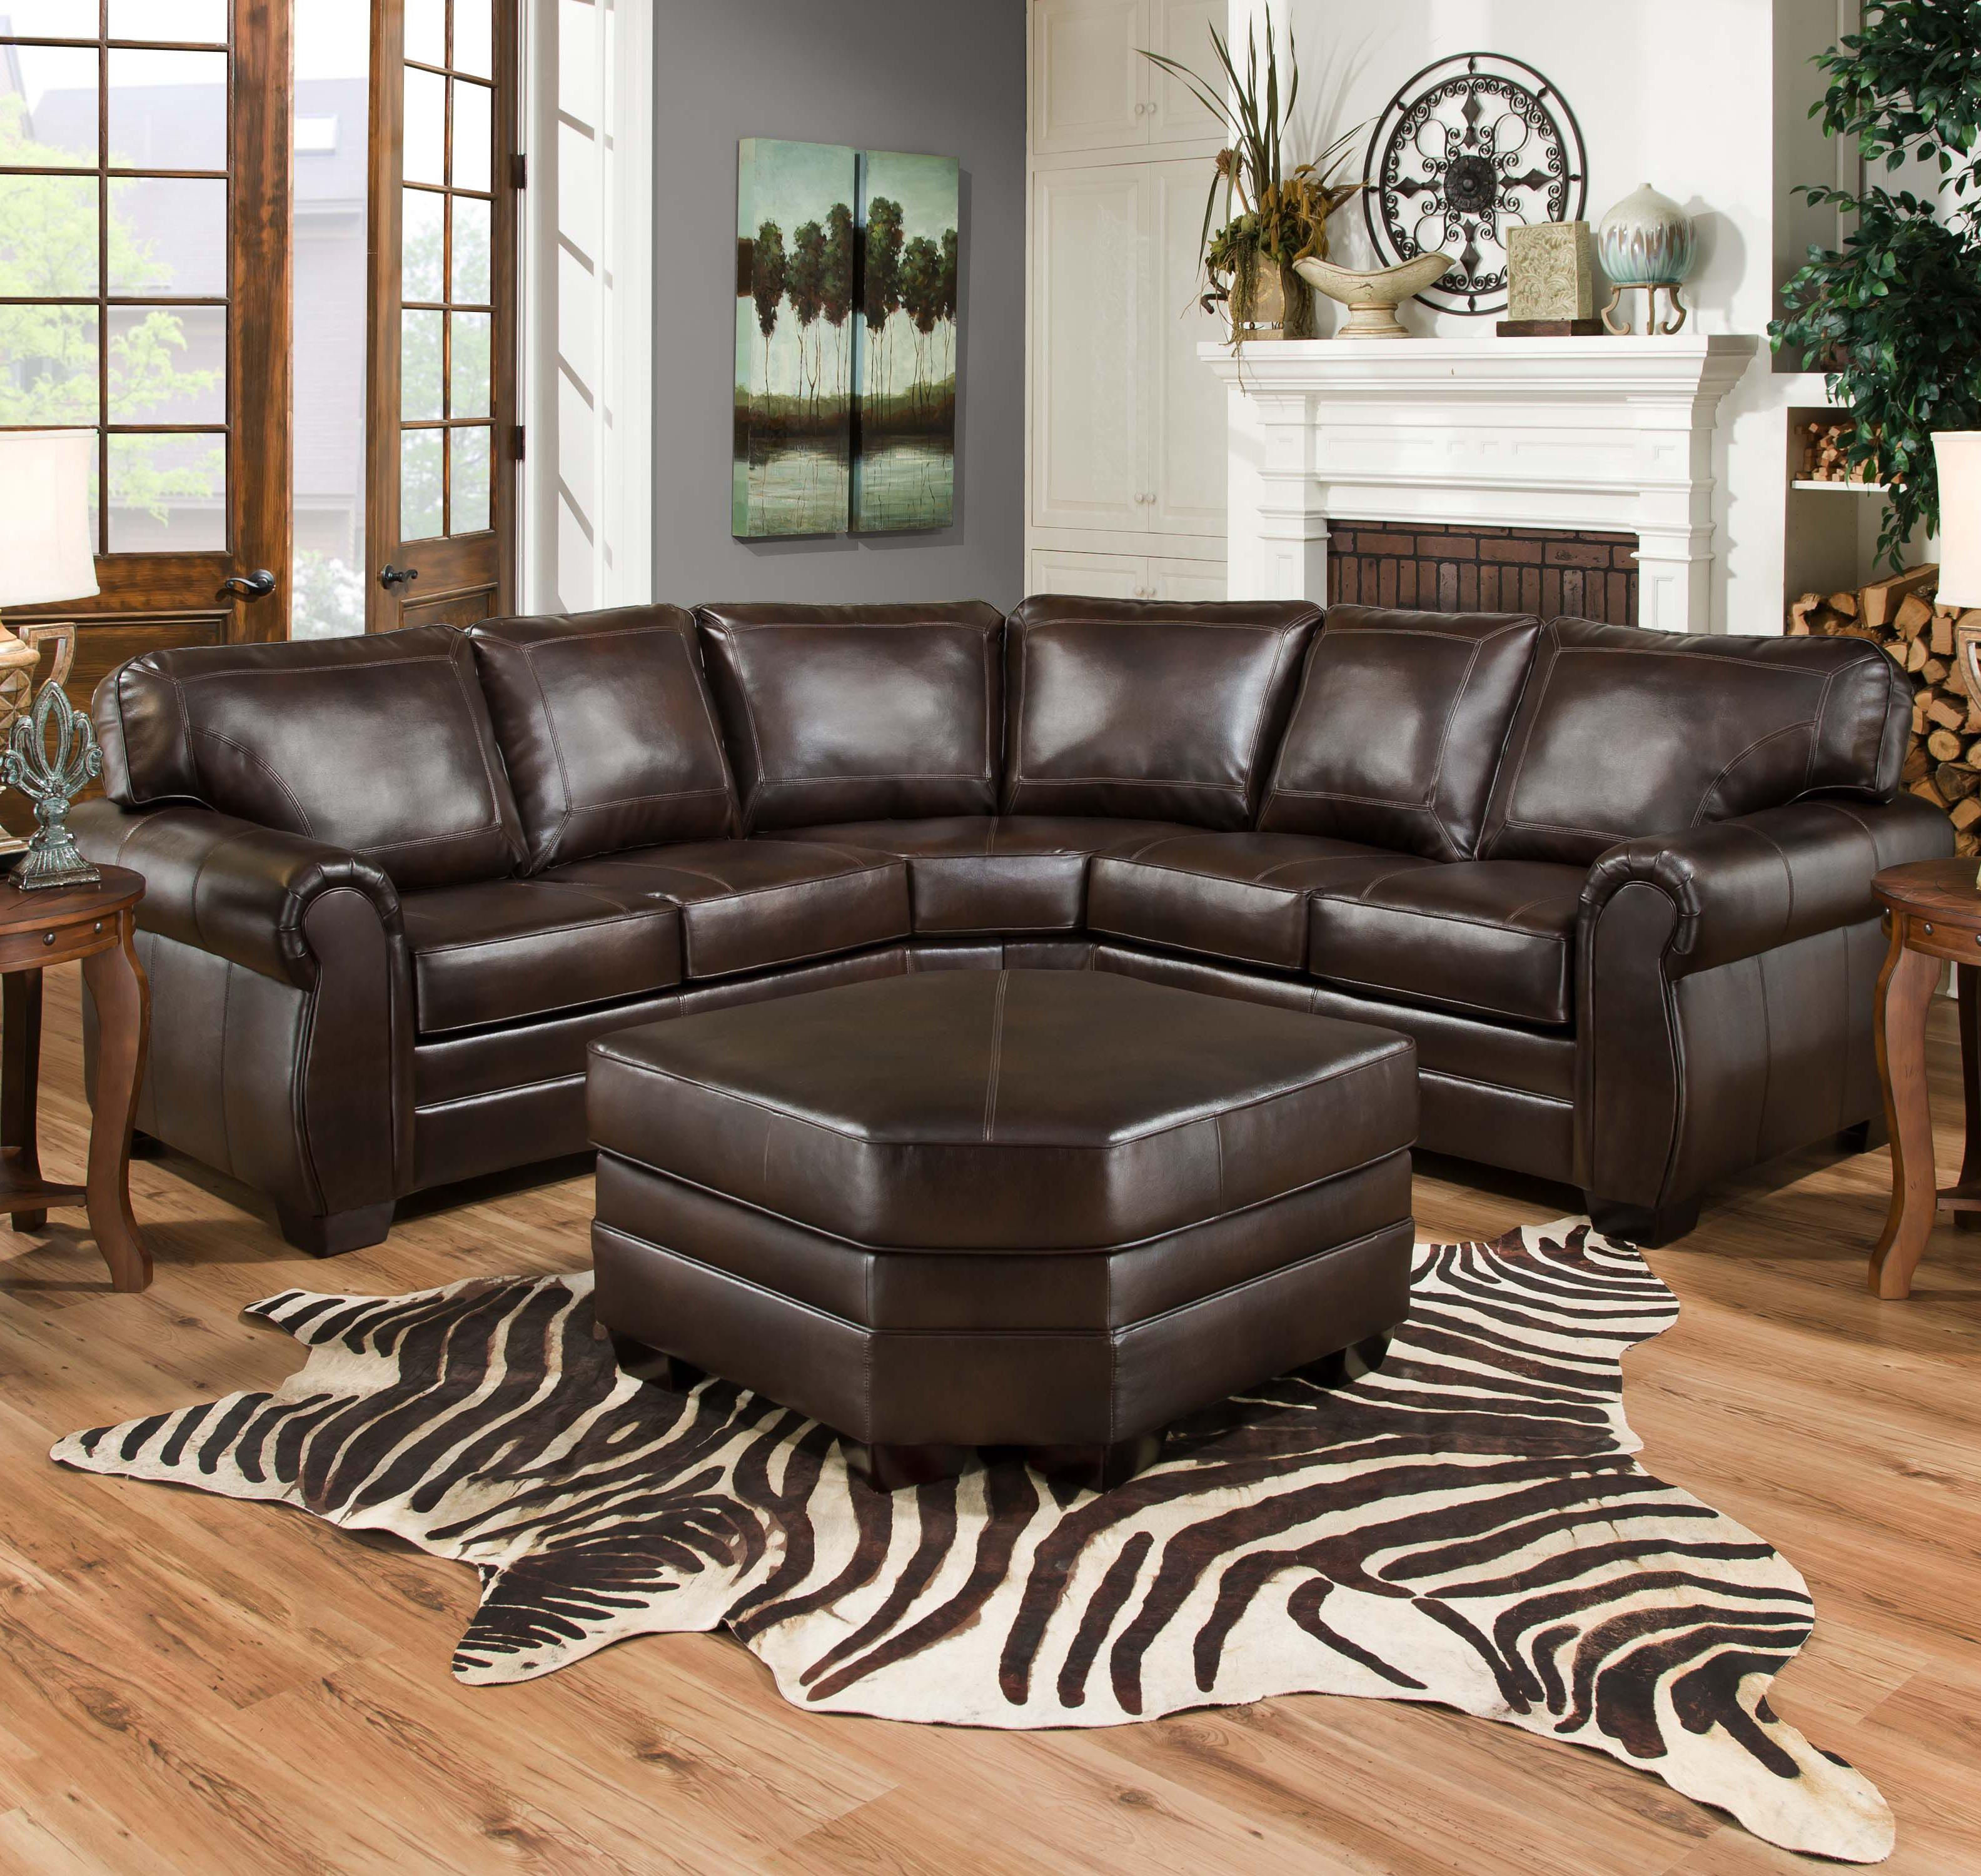 Simmons upholstery 9222 traditional sectional sofa with for Simmons upholstery sectional sofa